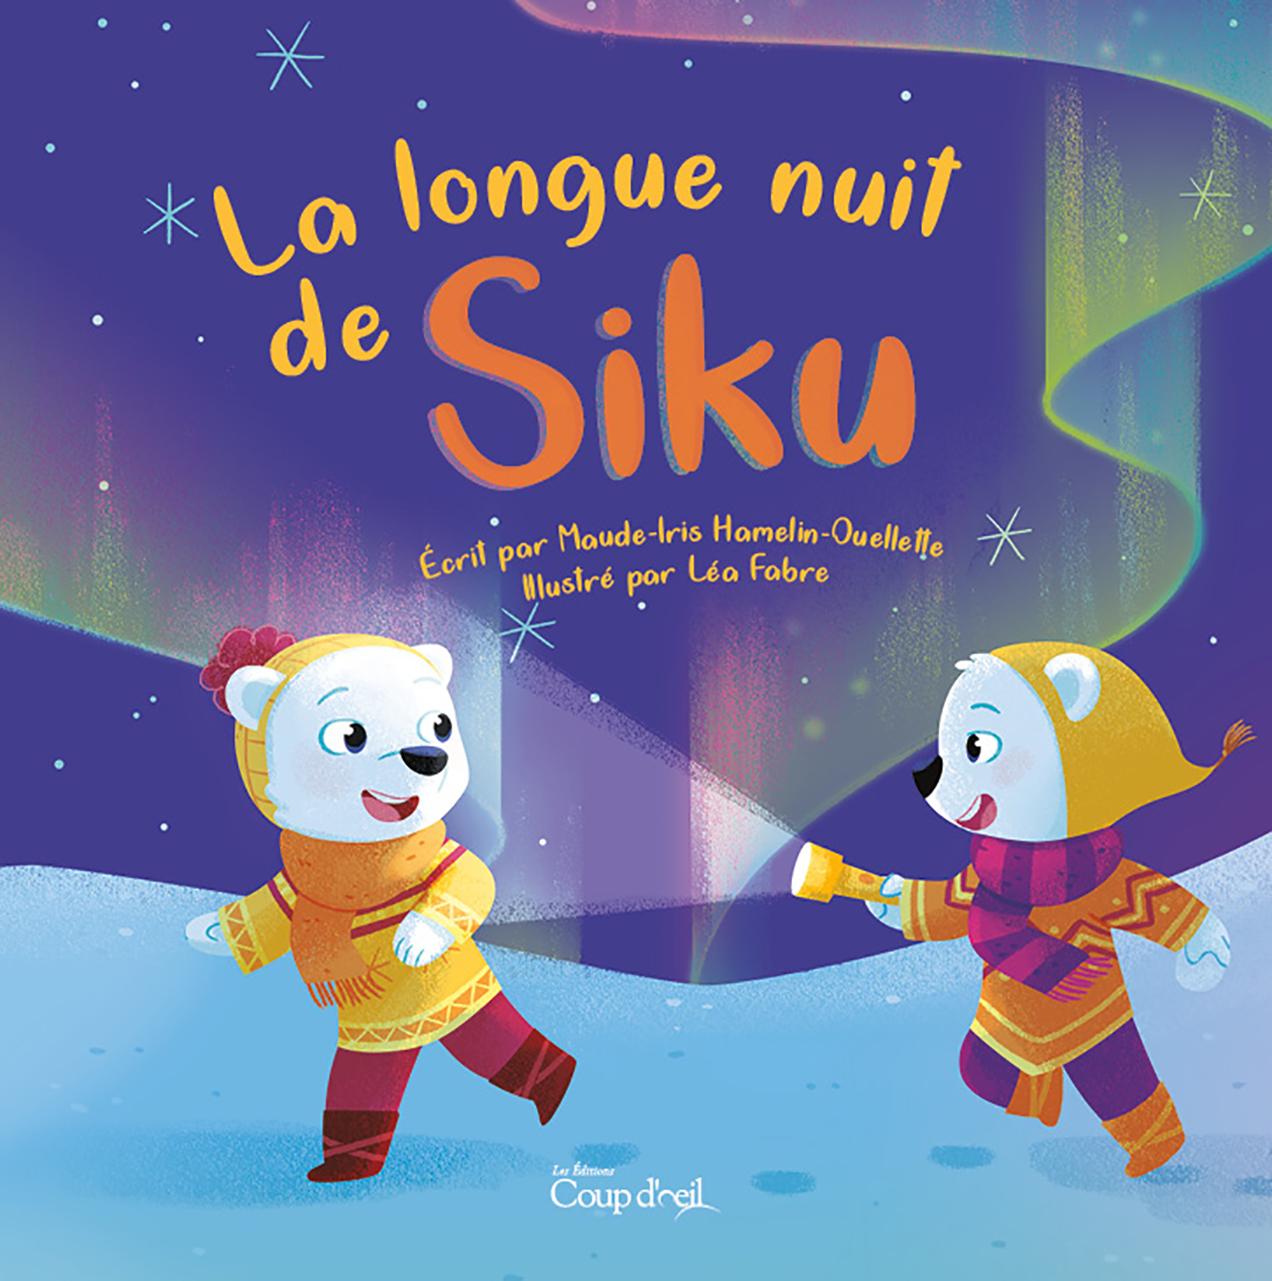 La longue nuit de Siku